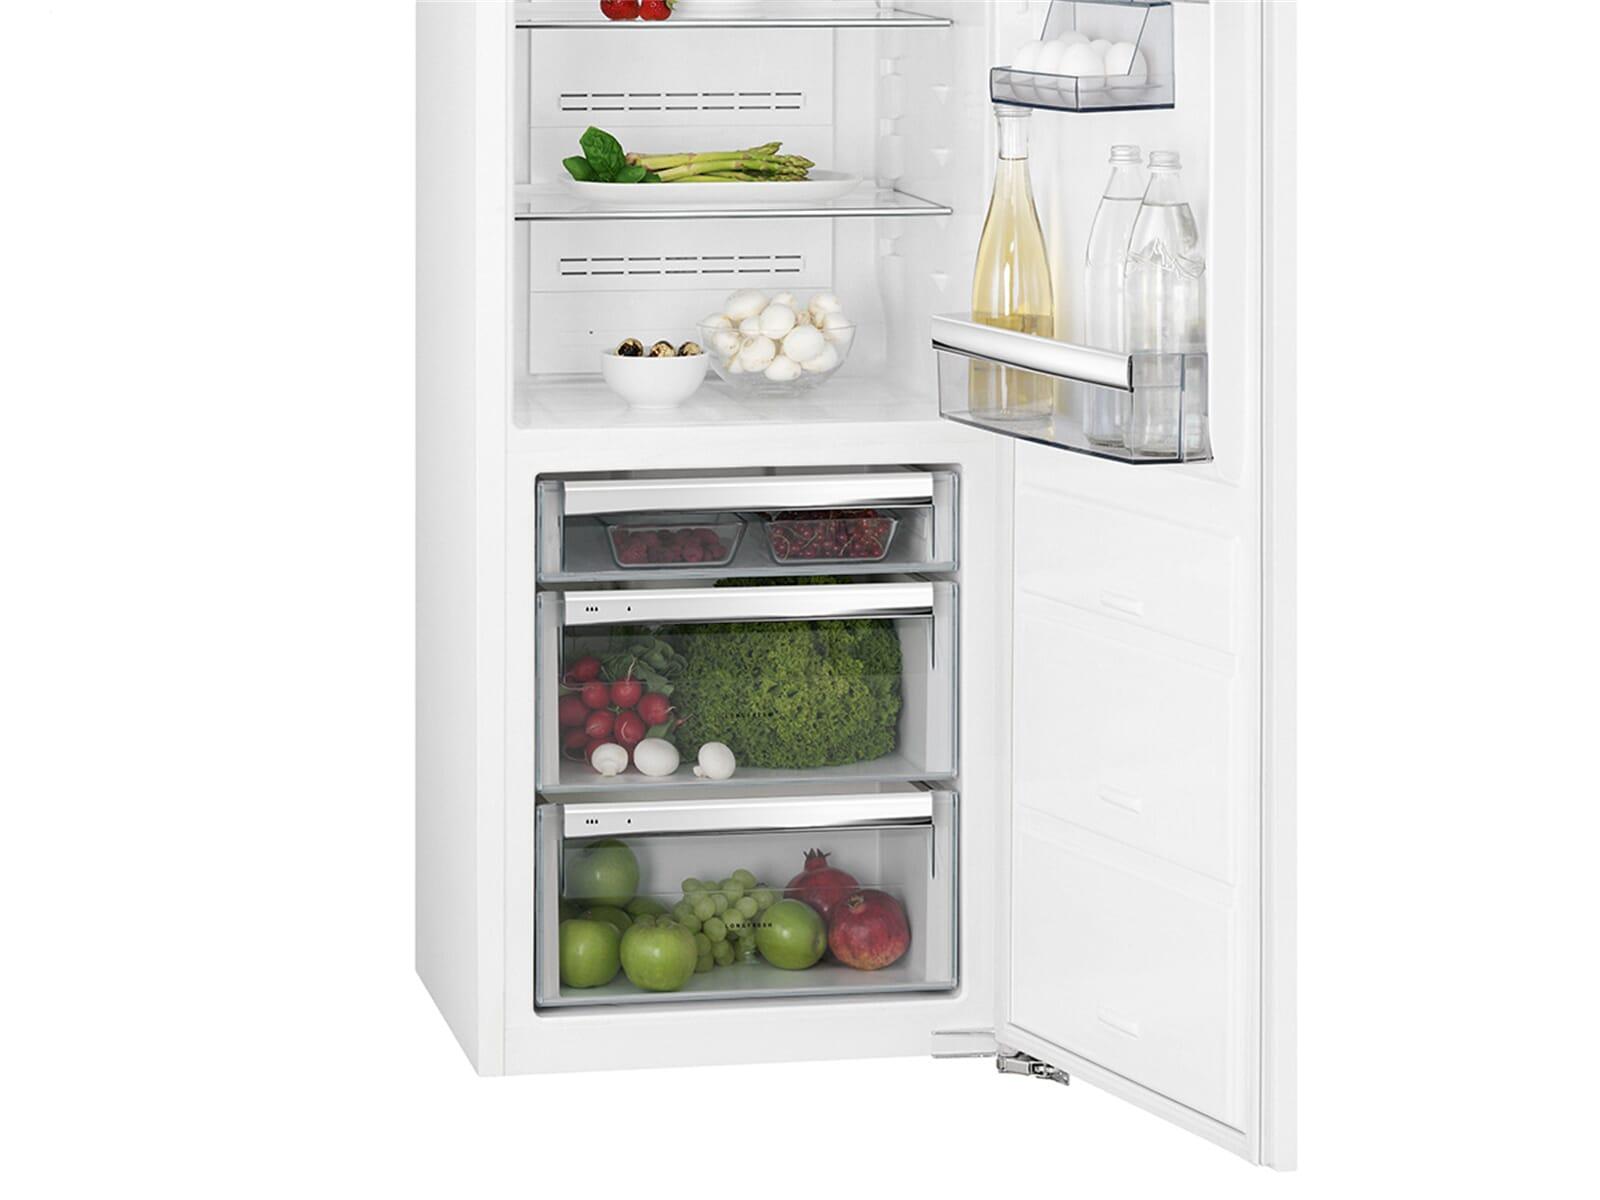 Aeg Kühlschrank Biofresh : Aeg ske zc einbaukühlschrank